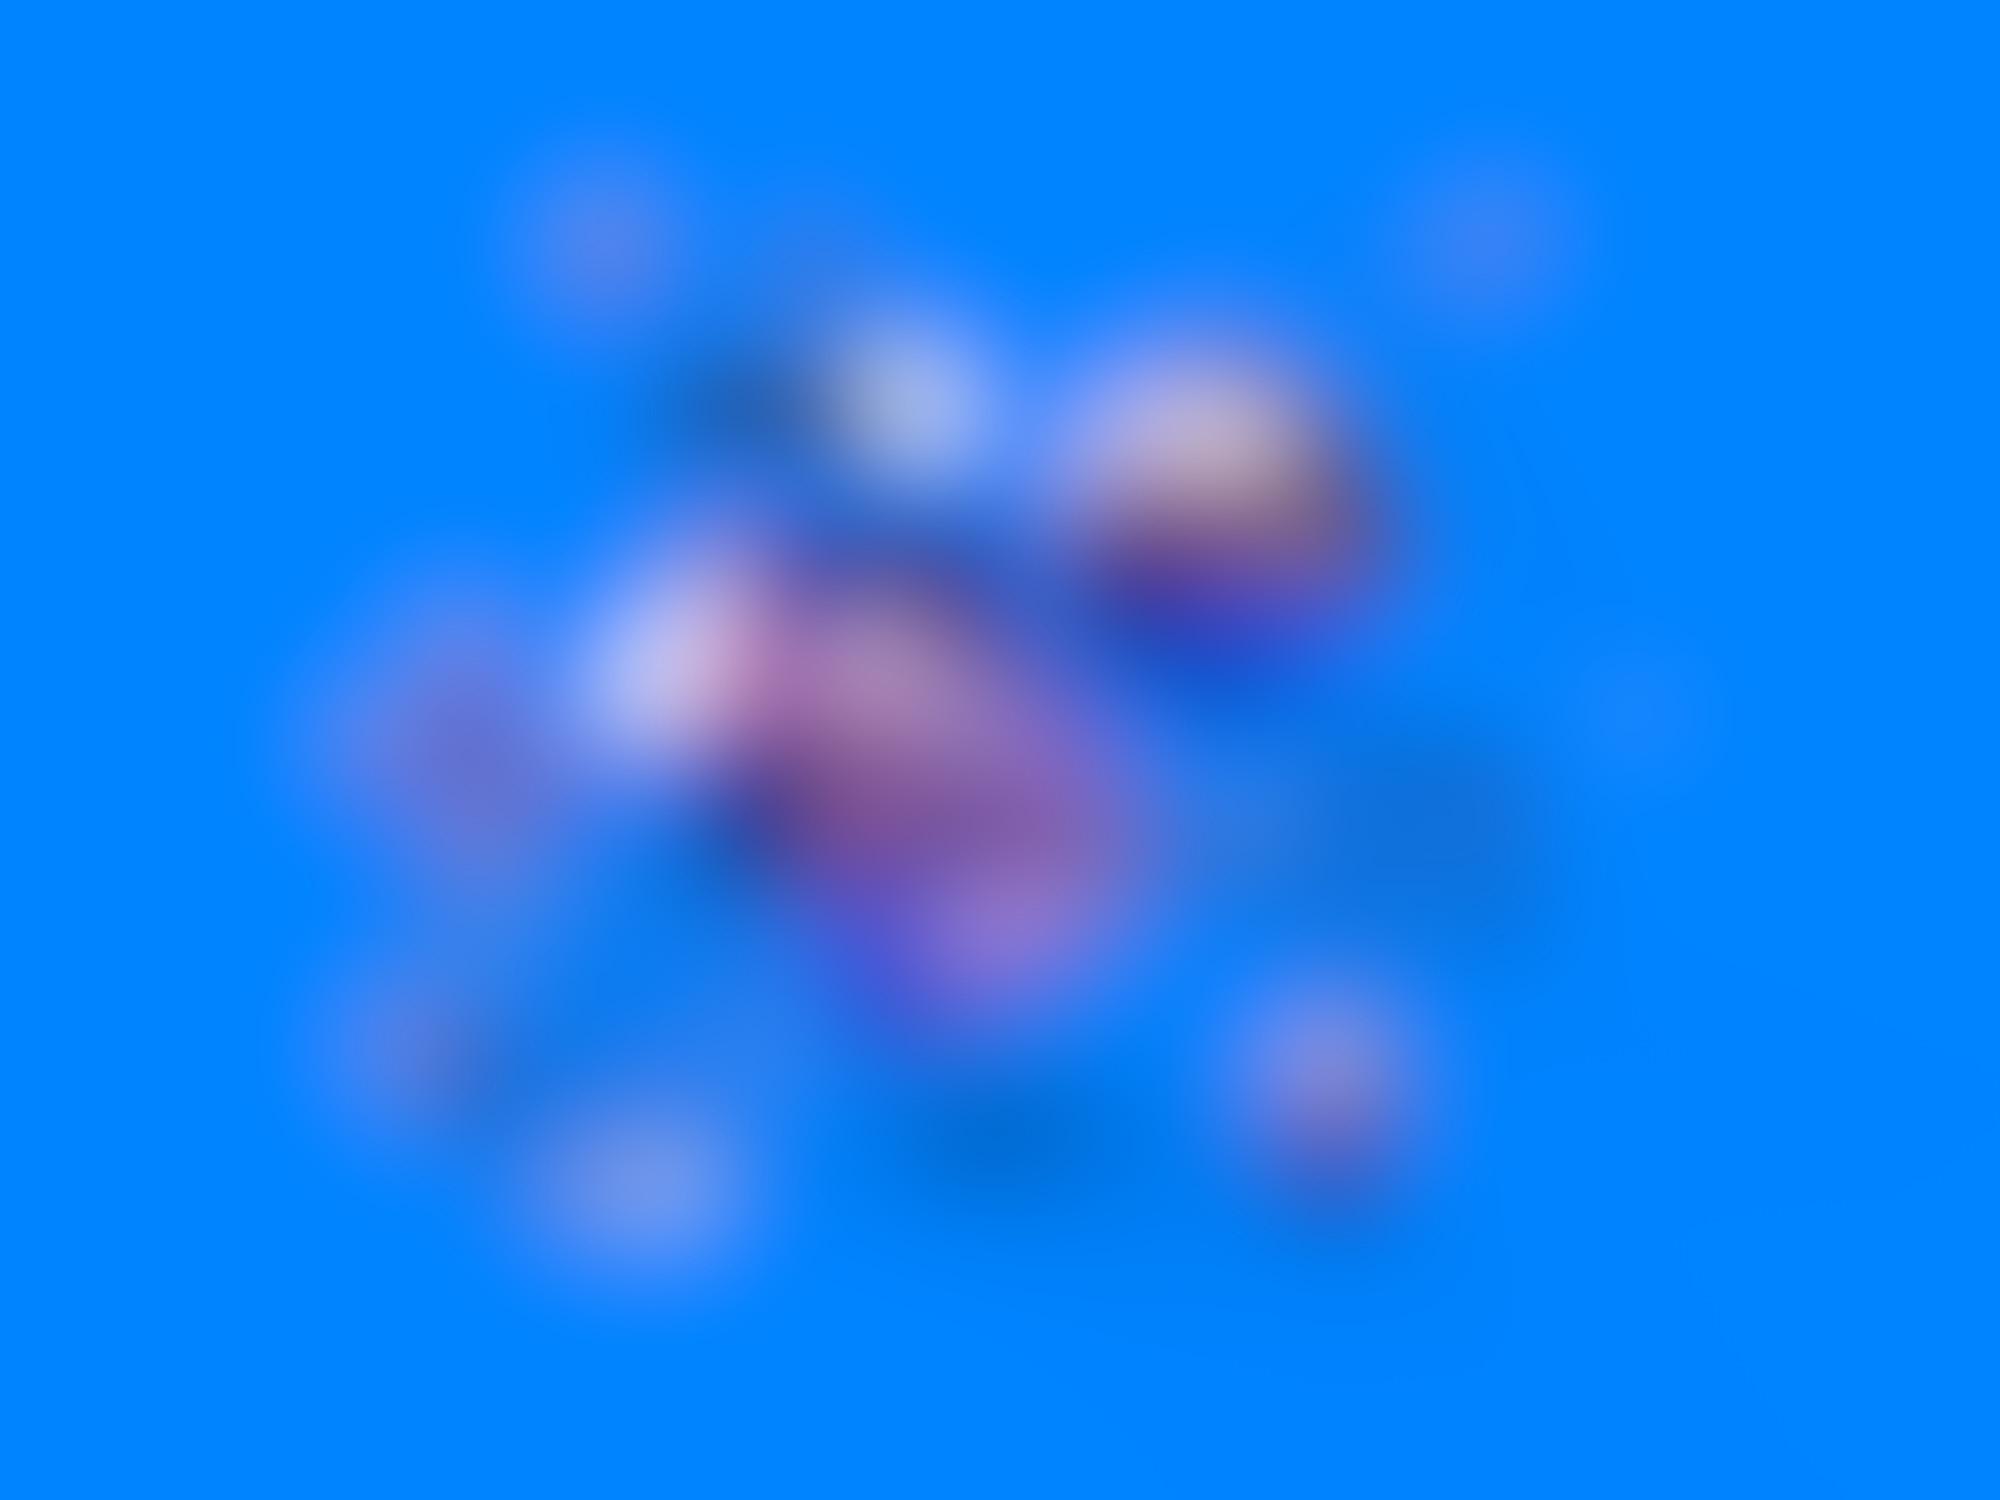 12 autocompressfitresizeixlibphp 1 1 0max h2000max w3 D2000q80s753fe0f6f9dc9c4a72ee33b9272af788